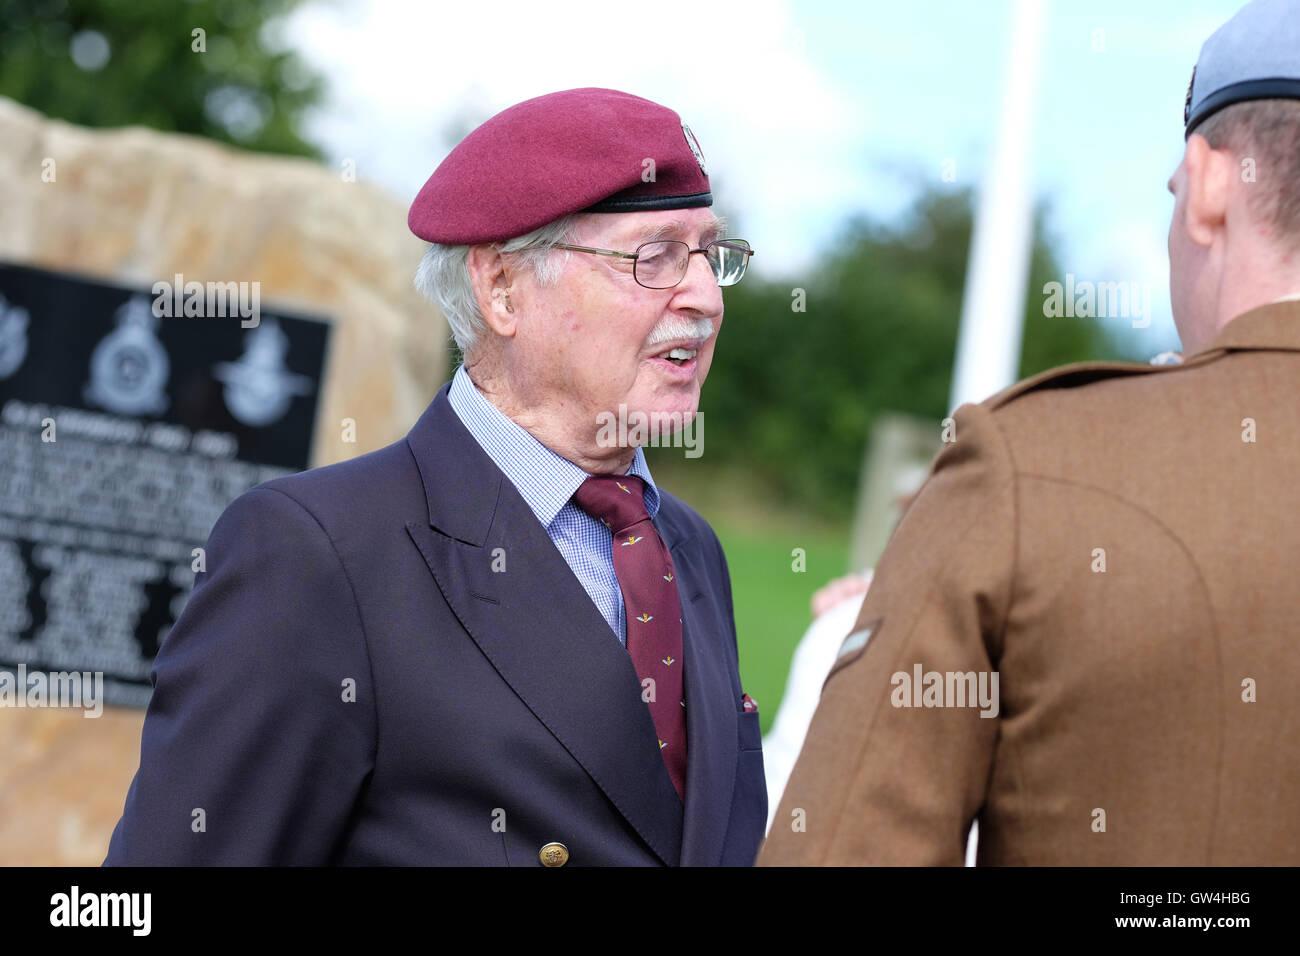 Shobdon airfield, Herefordshire, UK - Sunday 11th September 2016 - Lt Col R.W.G 'Nick' Nicholls of the Glider - Stock Image